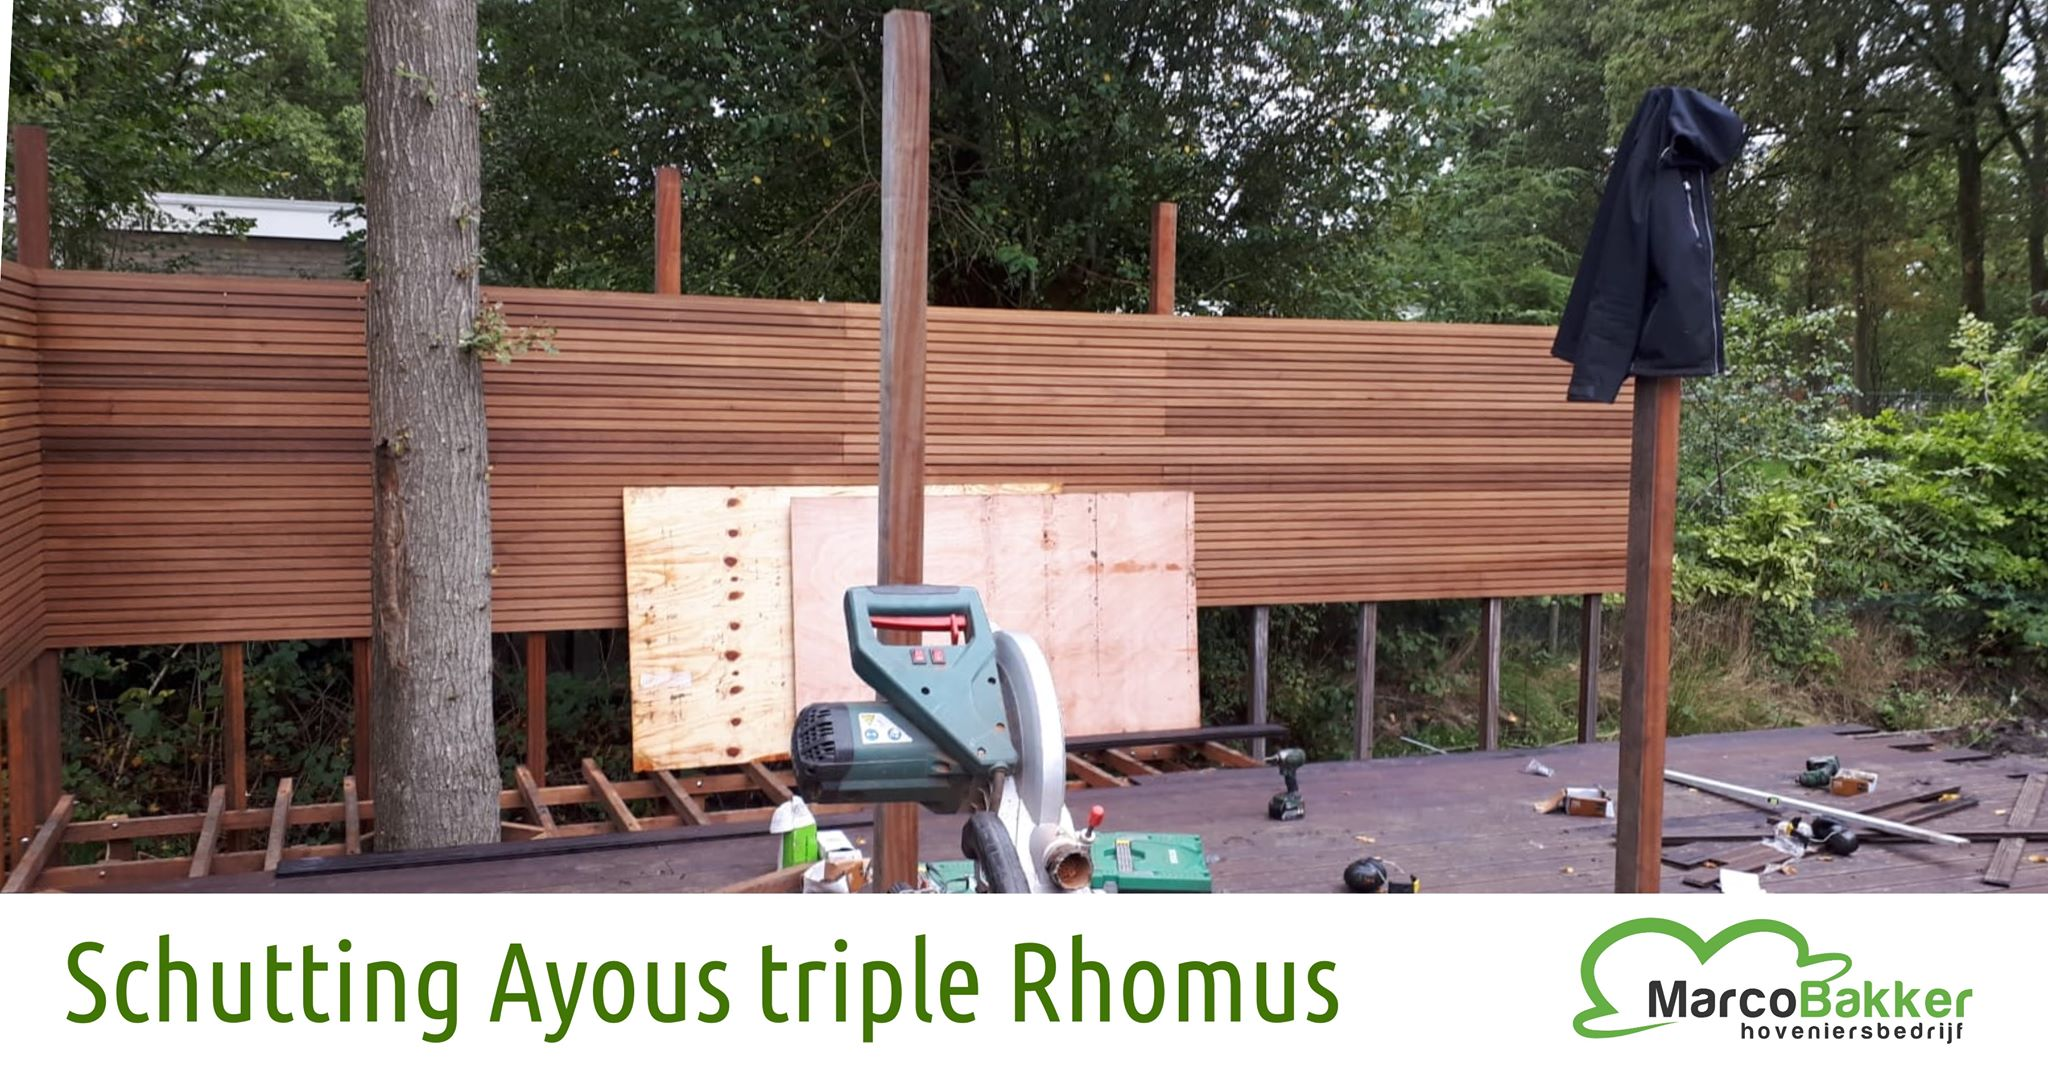 Schutting van Ayous Triple Rhombus